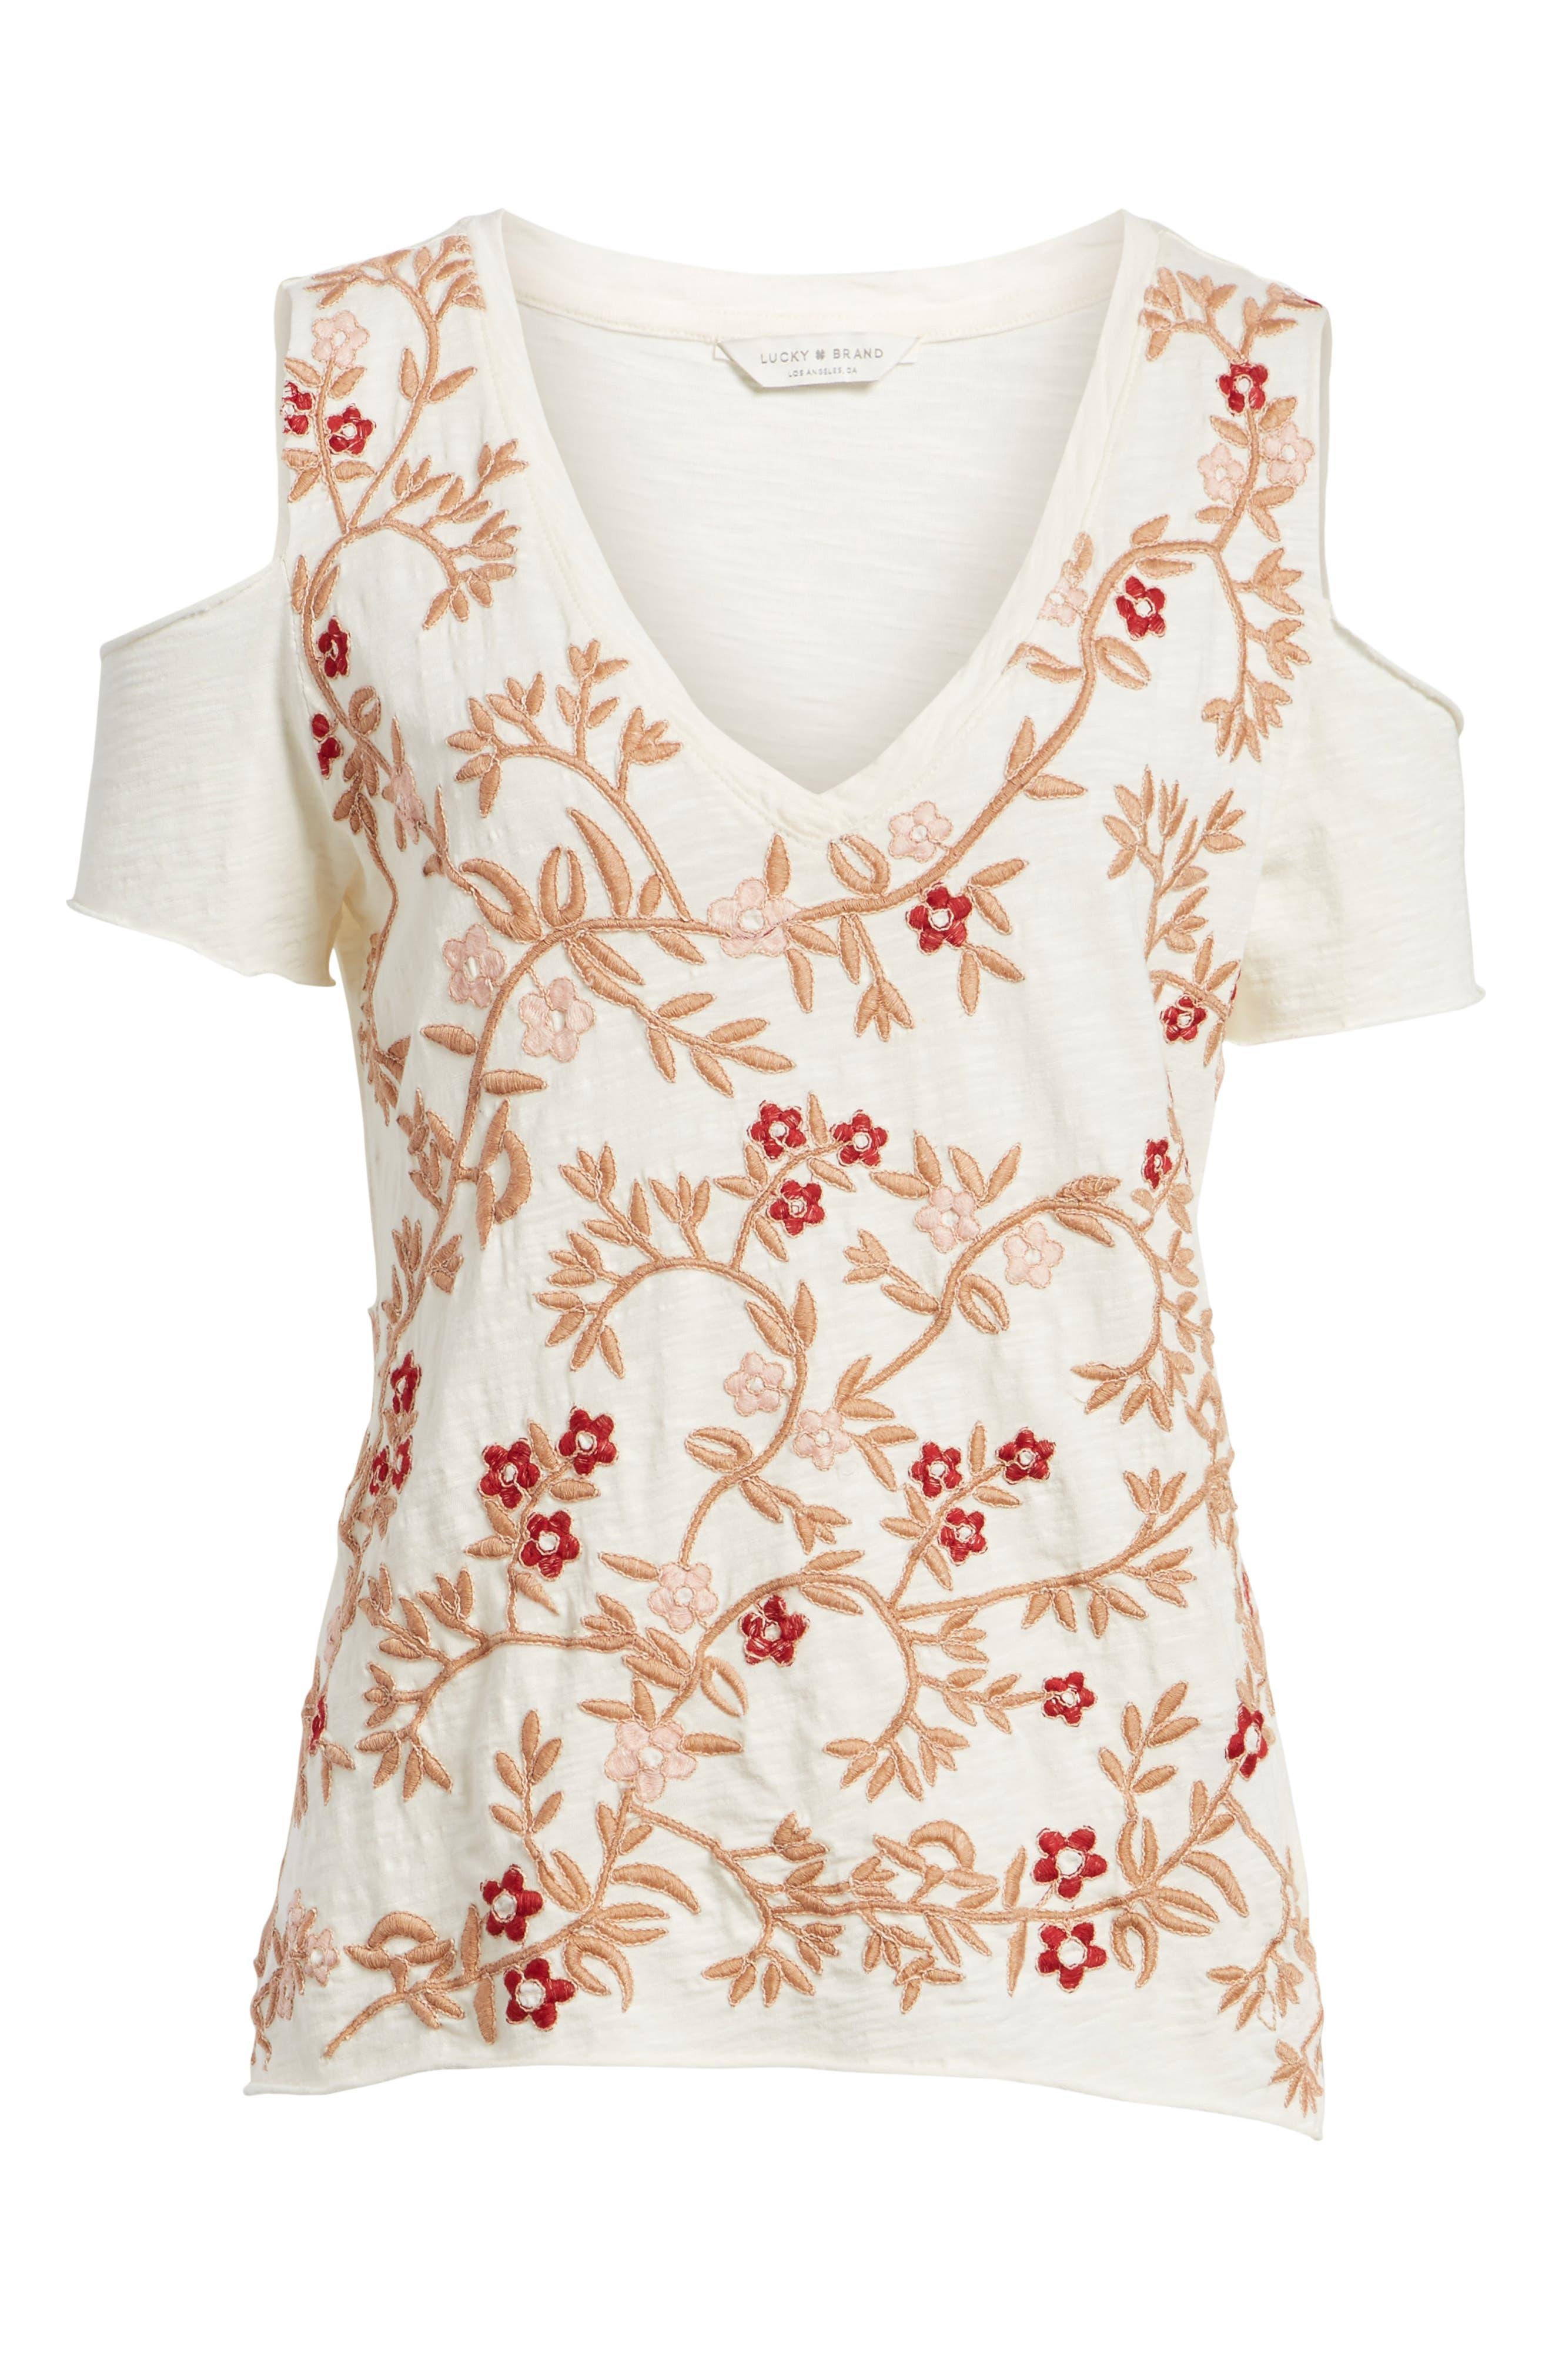 Floral Embroidered Cold Shoulder Top,                             Alternate thumbnail 6, color,                             690